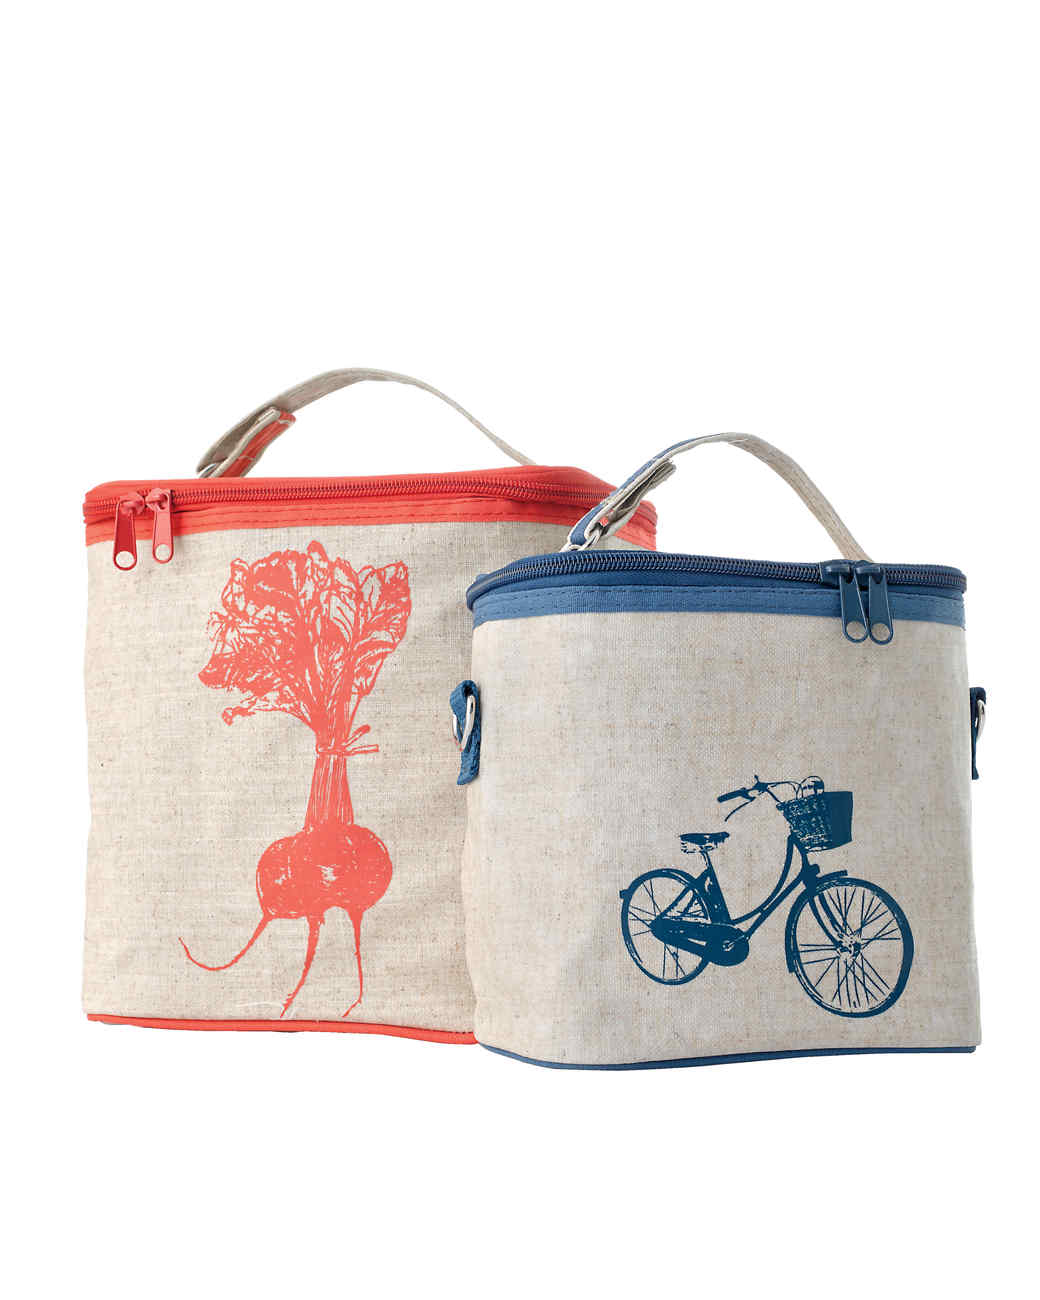 bicycle-tote-lunch-bag-md110877.jpg